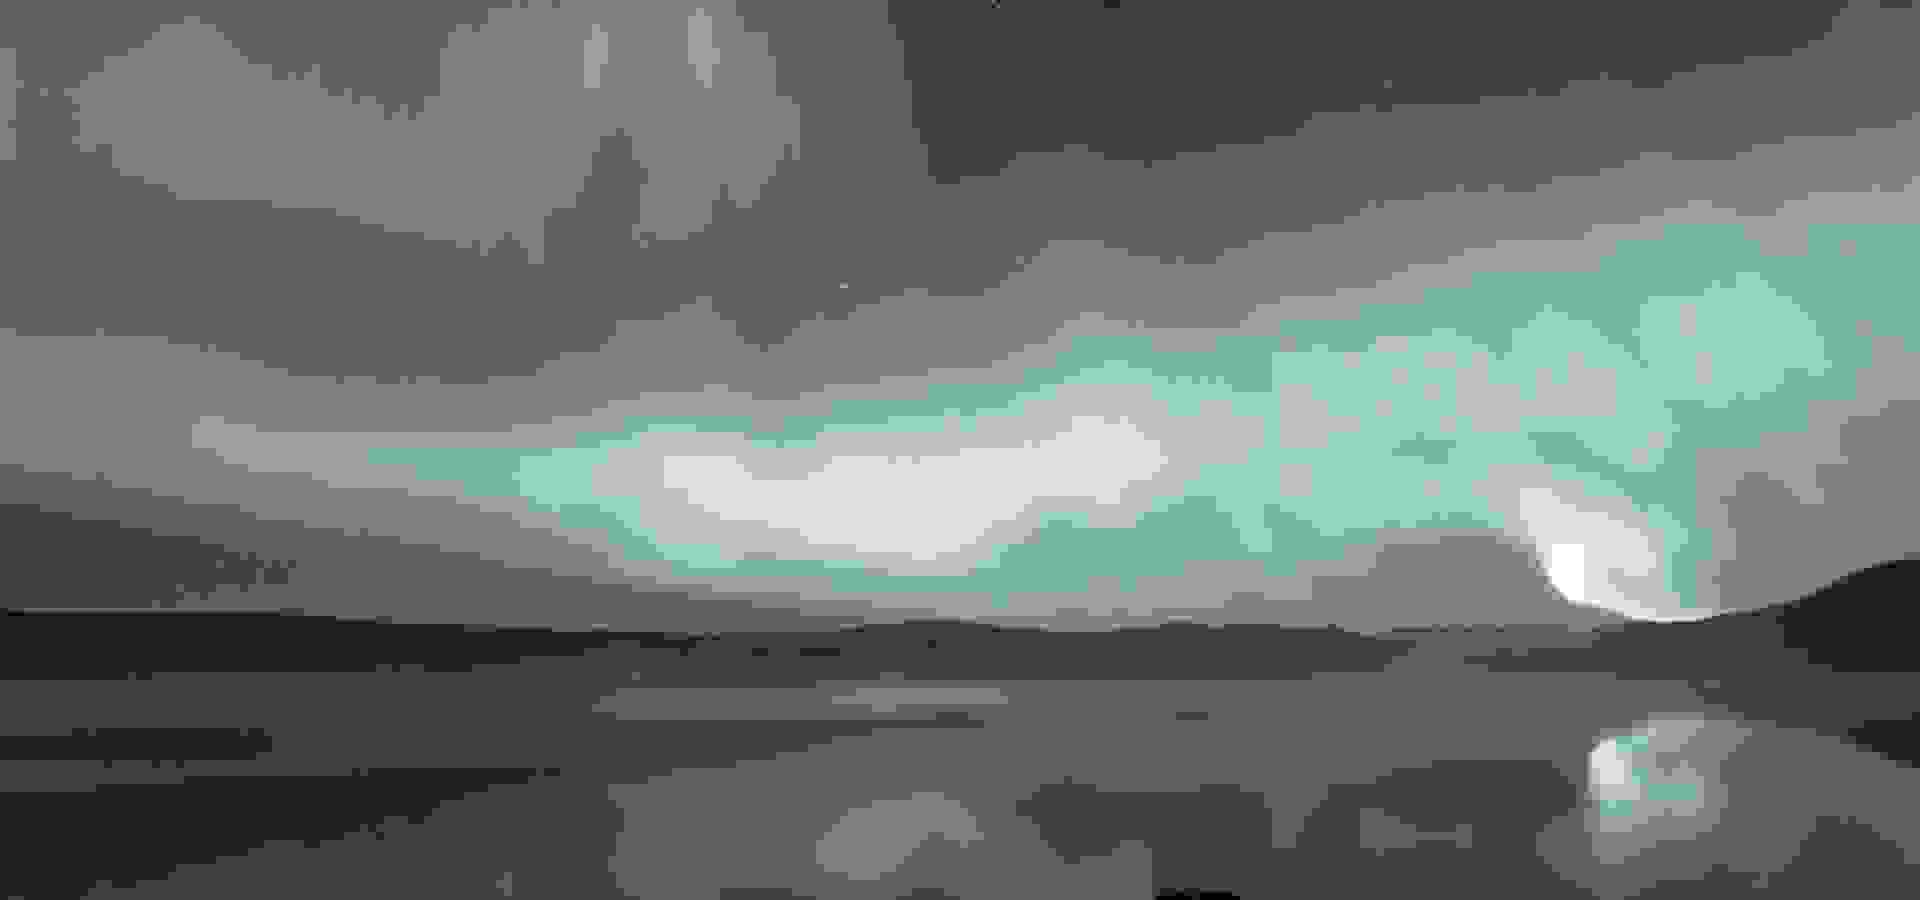 norrsken, northern lights, aurora borealis, 1240 x 900, mia stålnacke